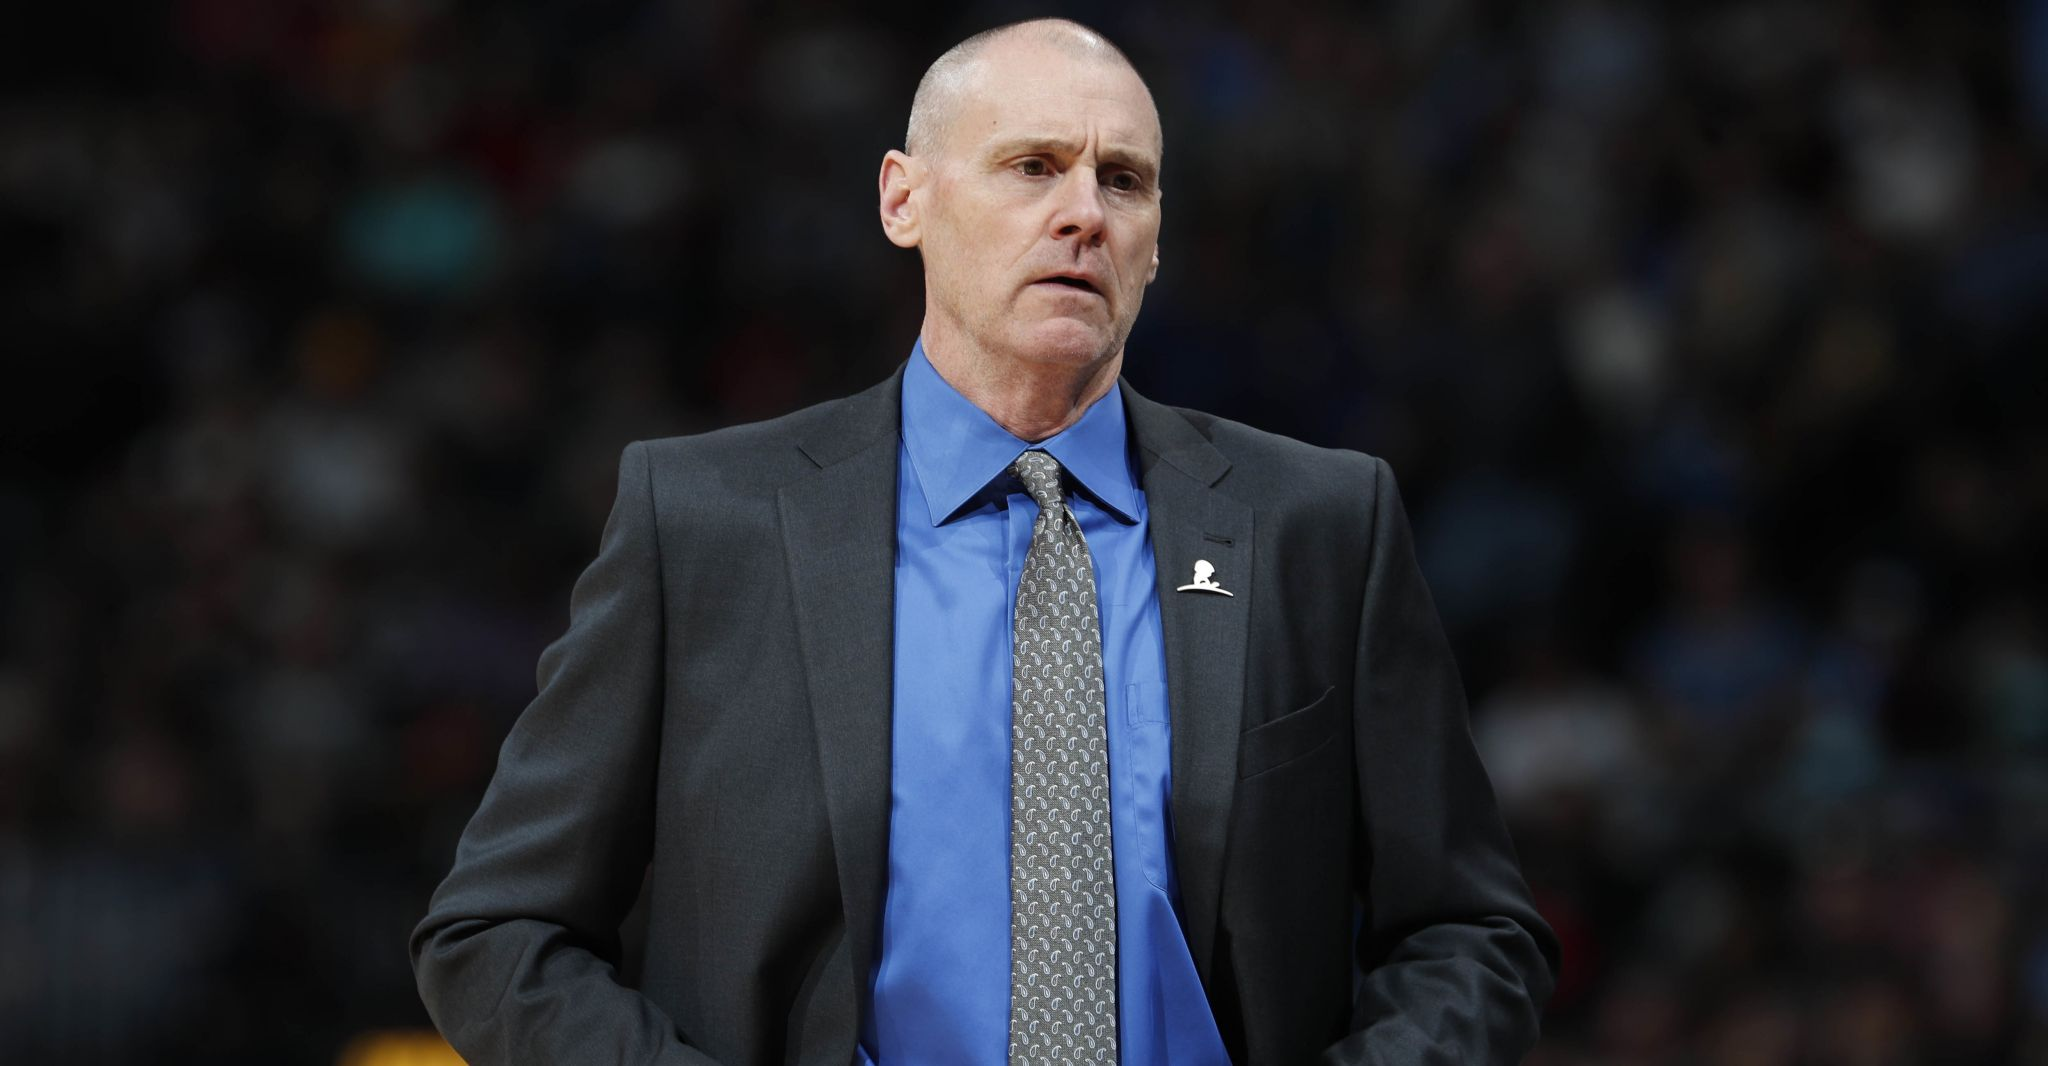 Mavericks coach Rick Carlisle on Rockets' recent moves: 'Houston, they're loading up'